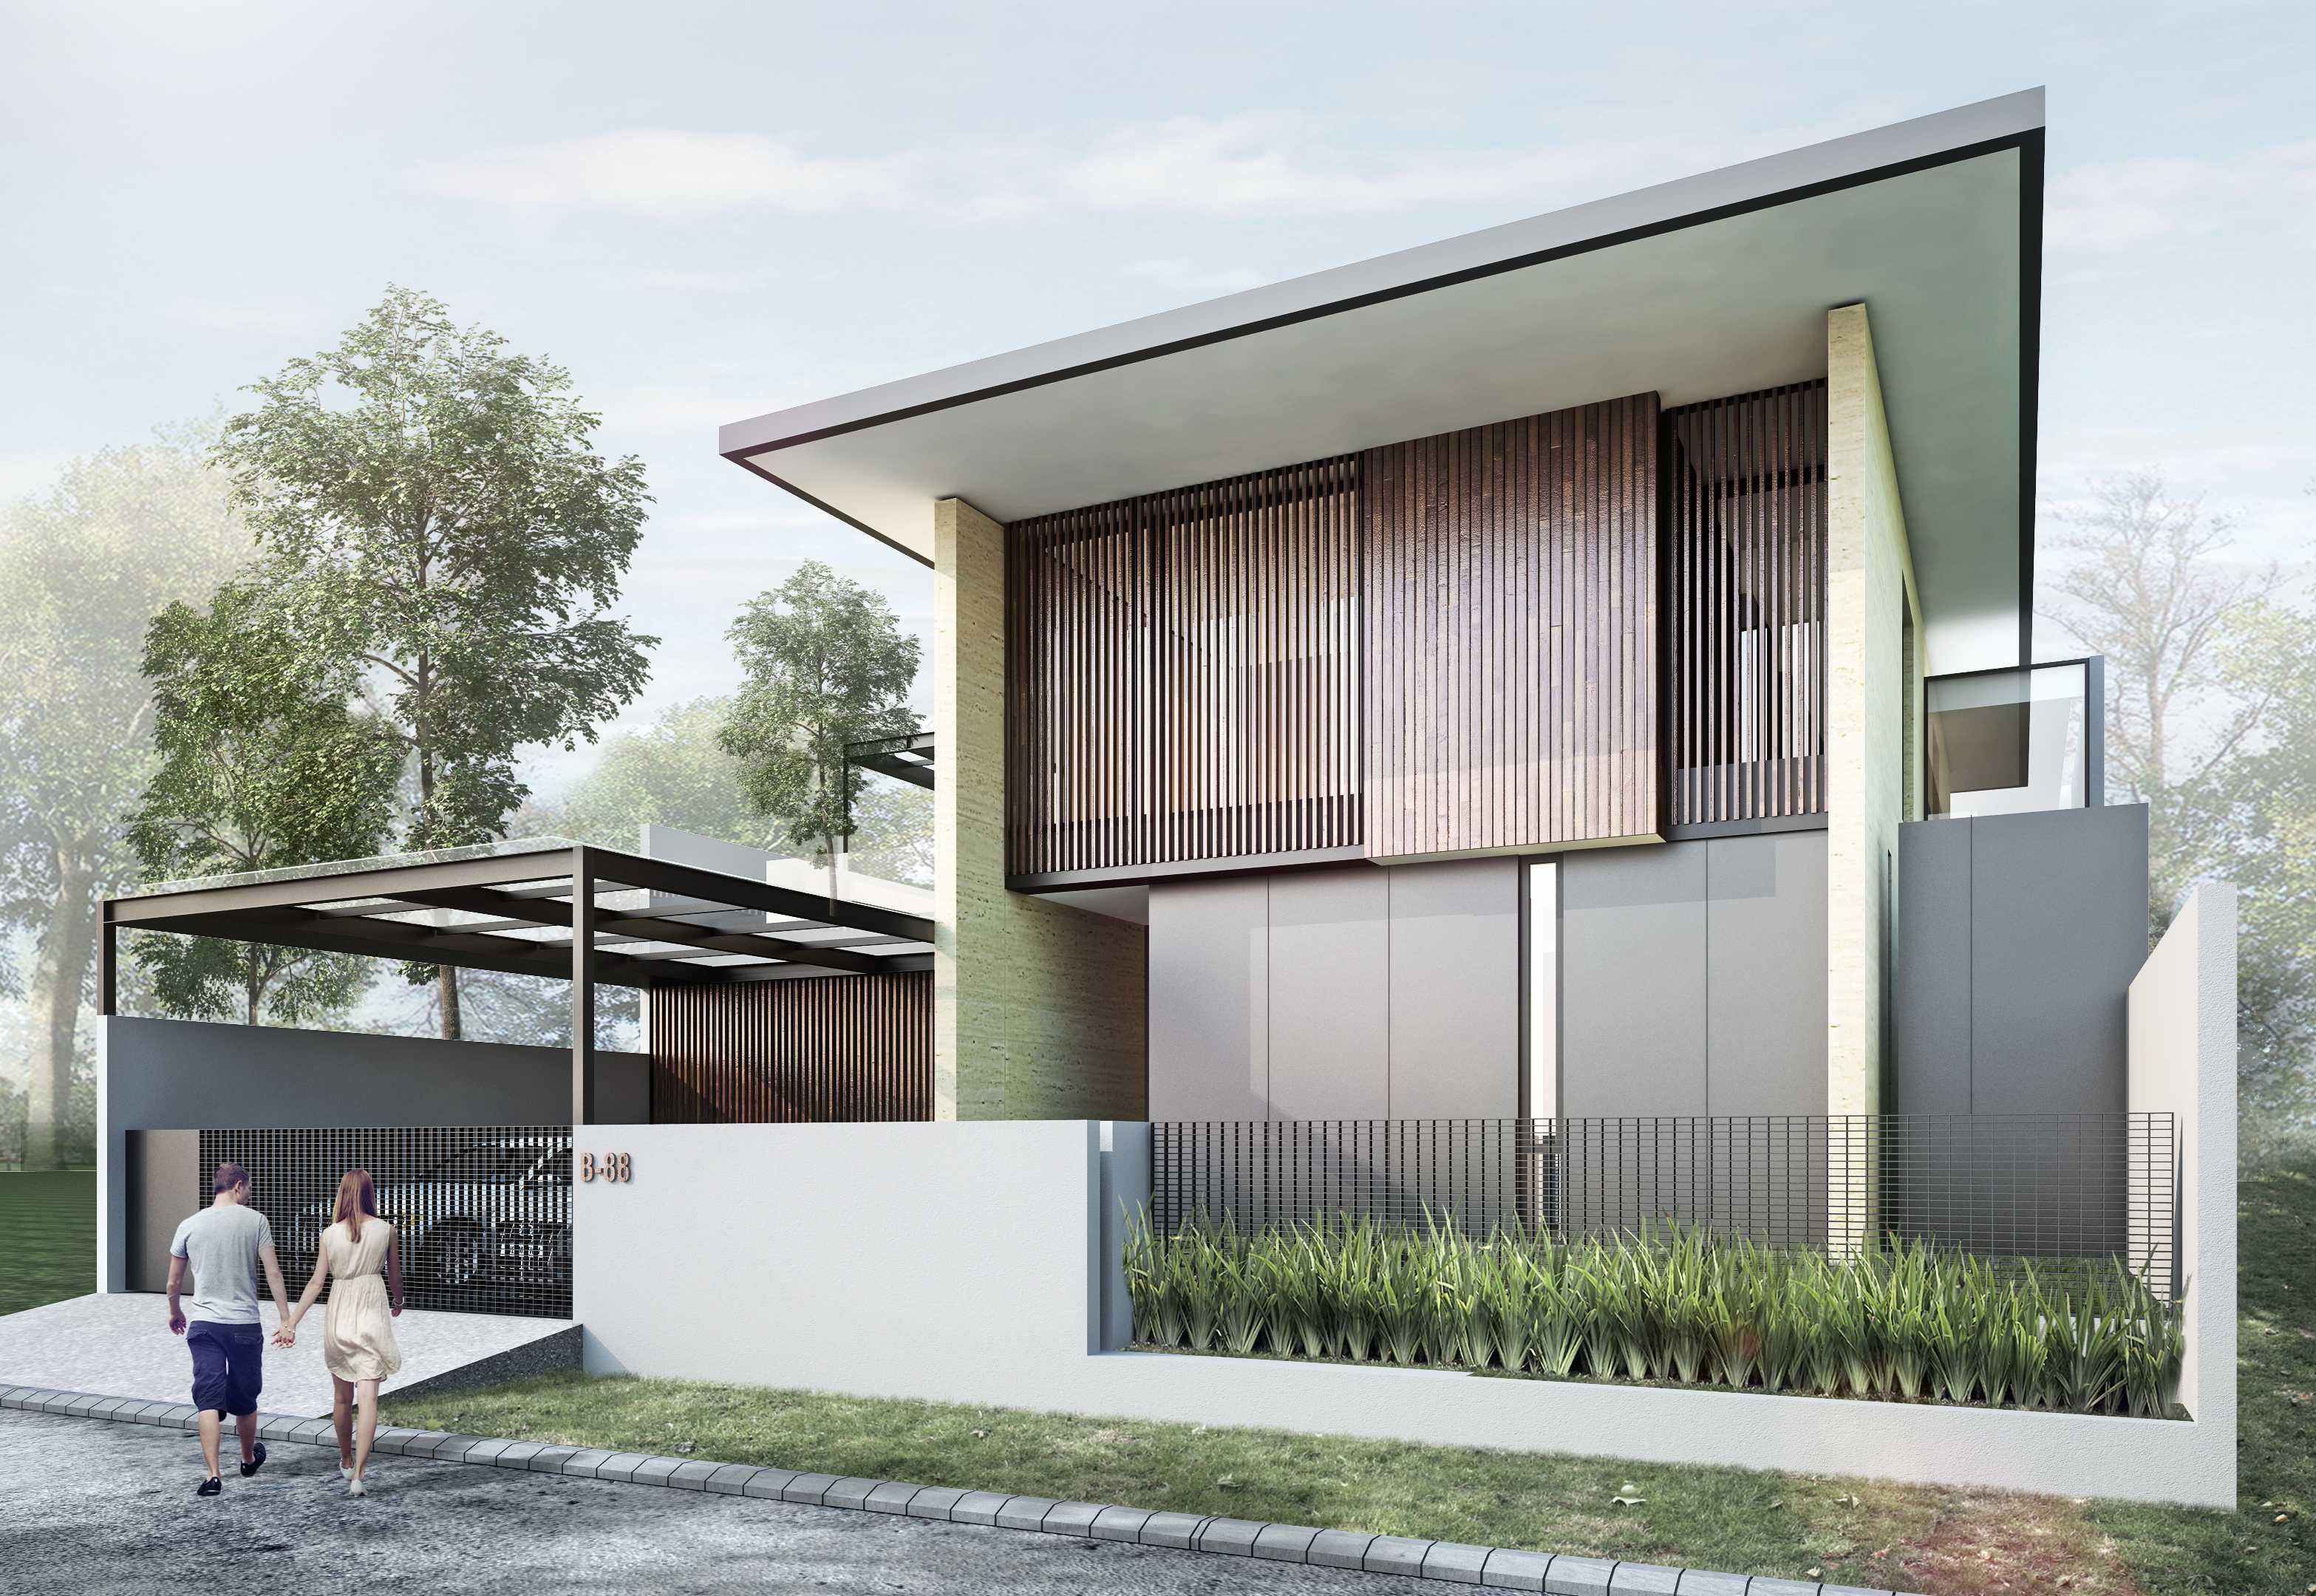 Ivan Priatman Architecture Si House Surabaya, Kota Sby, Jawa Timur, Indonesia Surabaya, Kota Sby, Jawa Timur, Indonesia Ivan-Priatman-Architecture-Si-House   59109